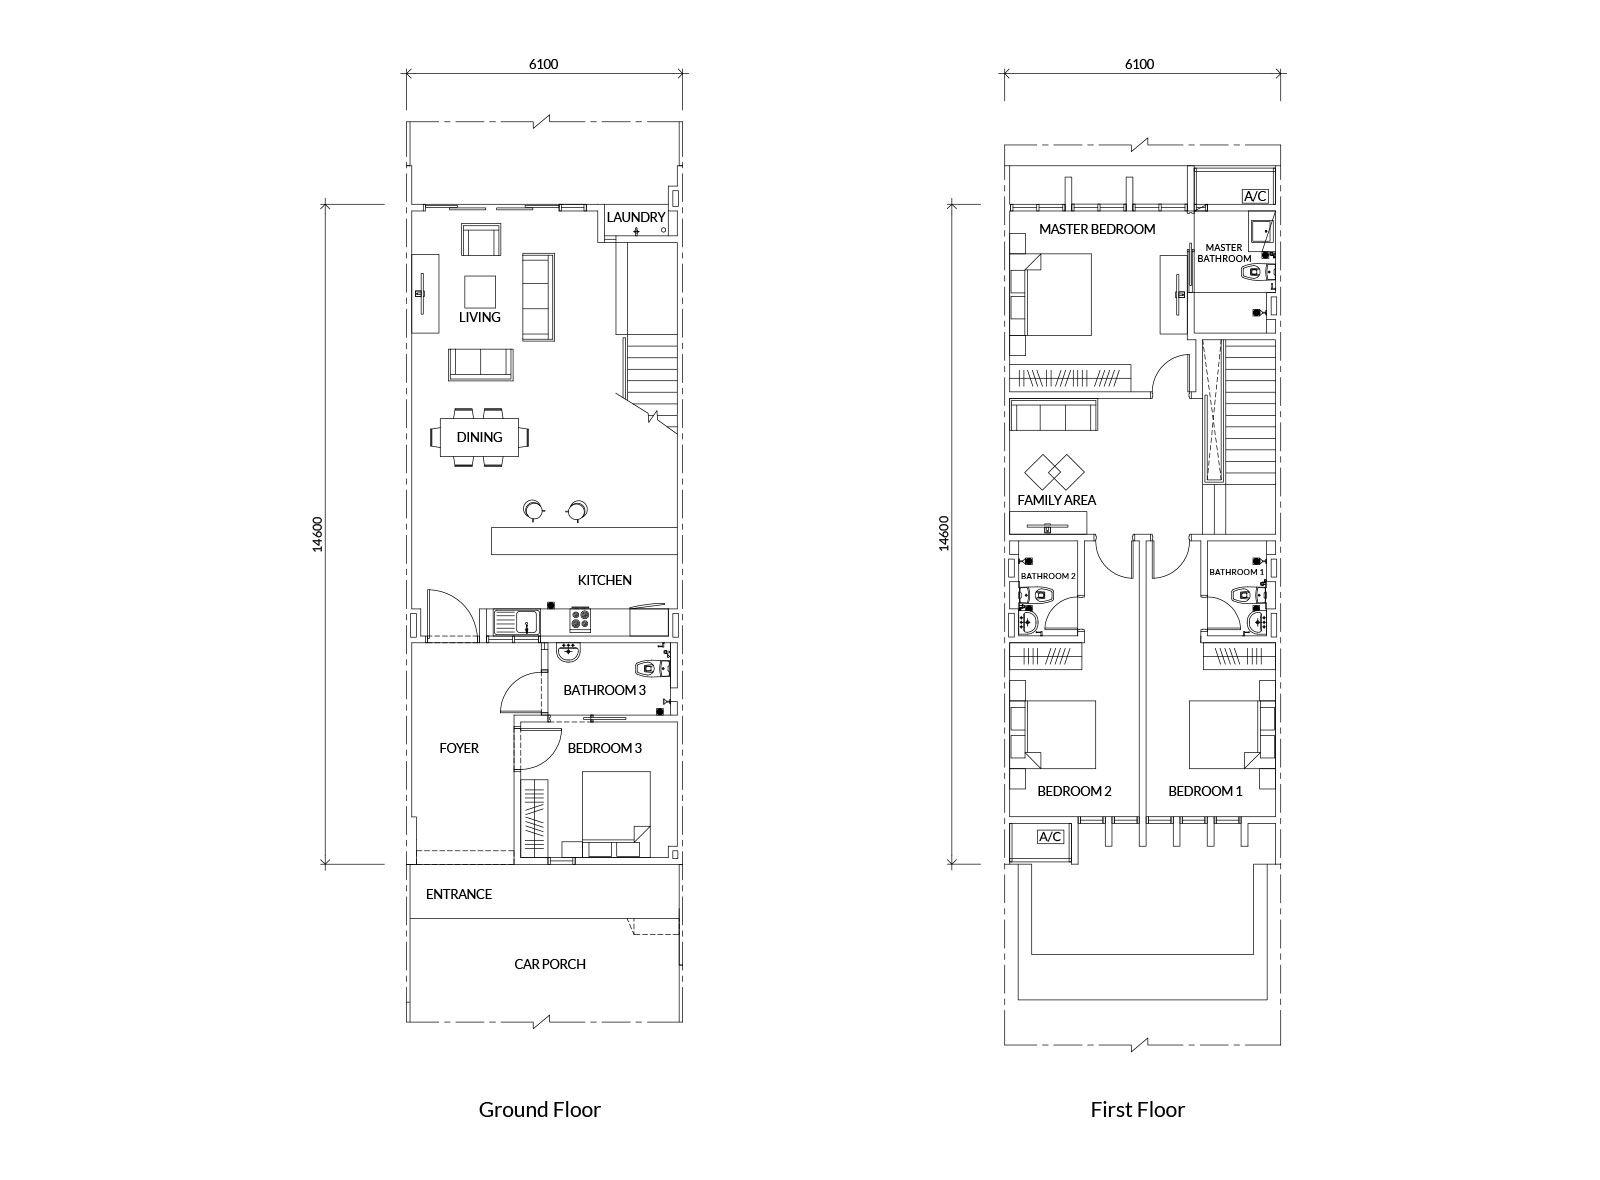 elmina valley phase 2 type B layout